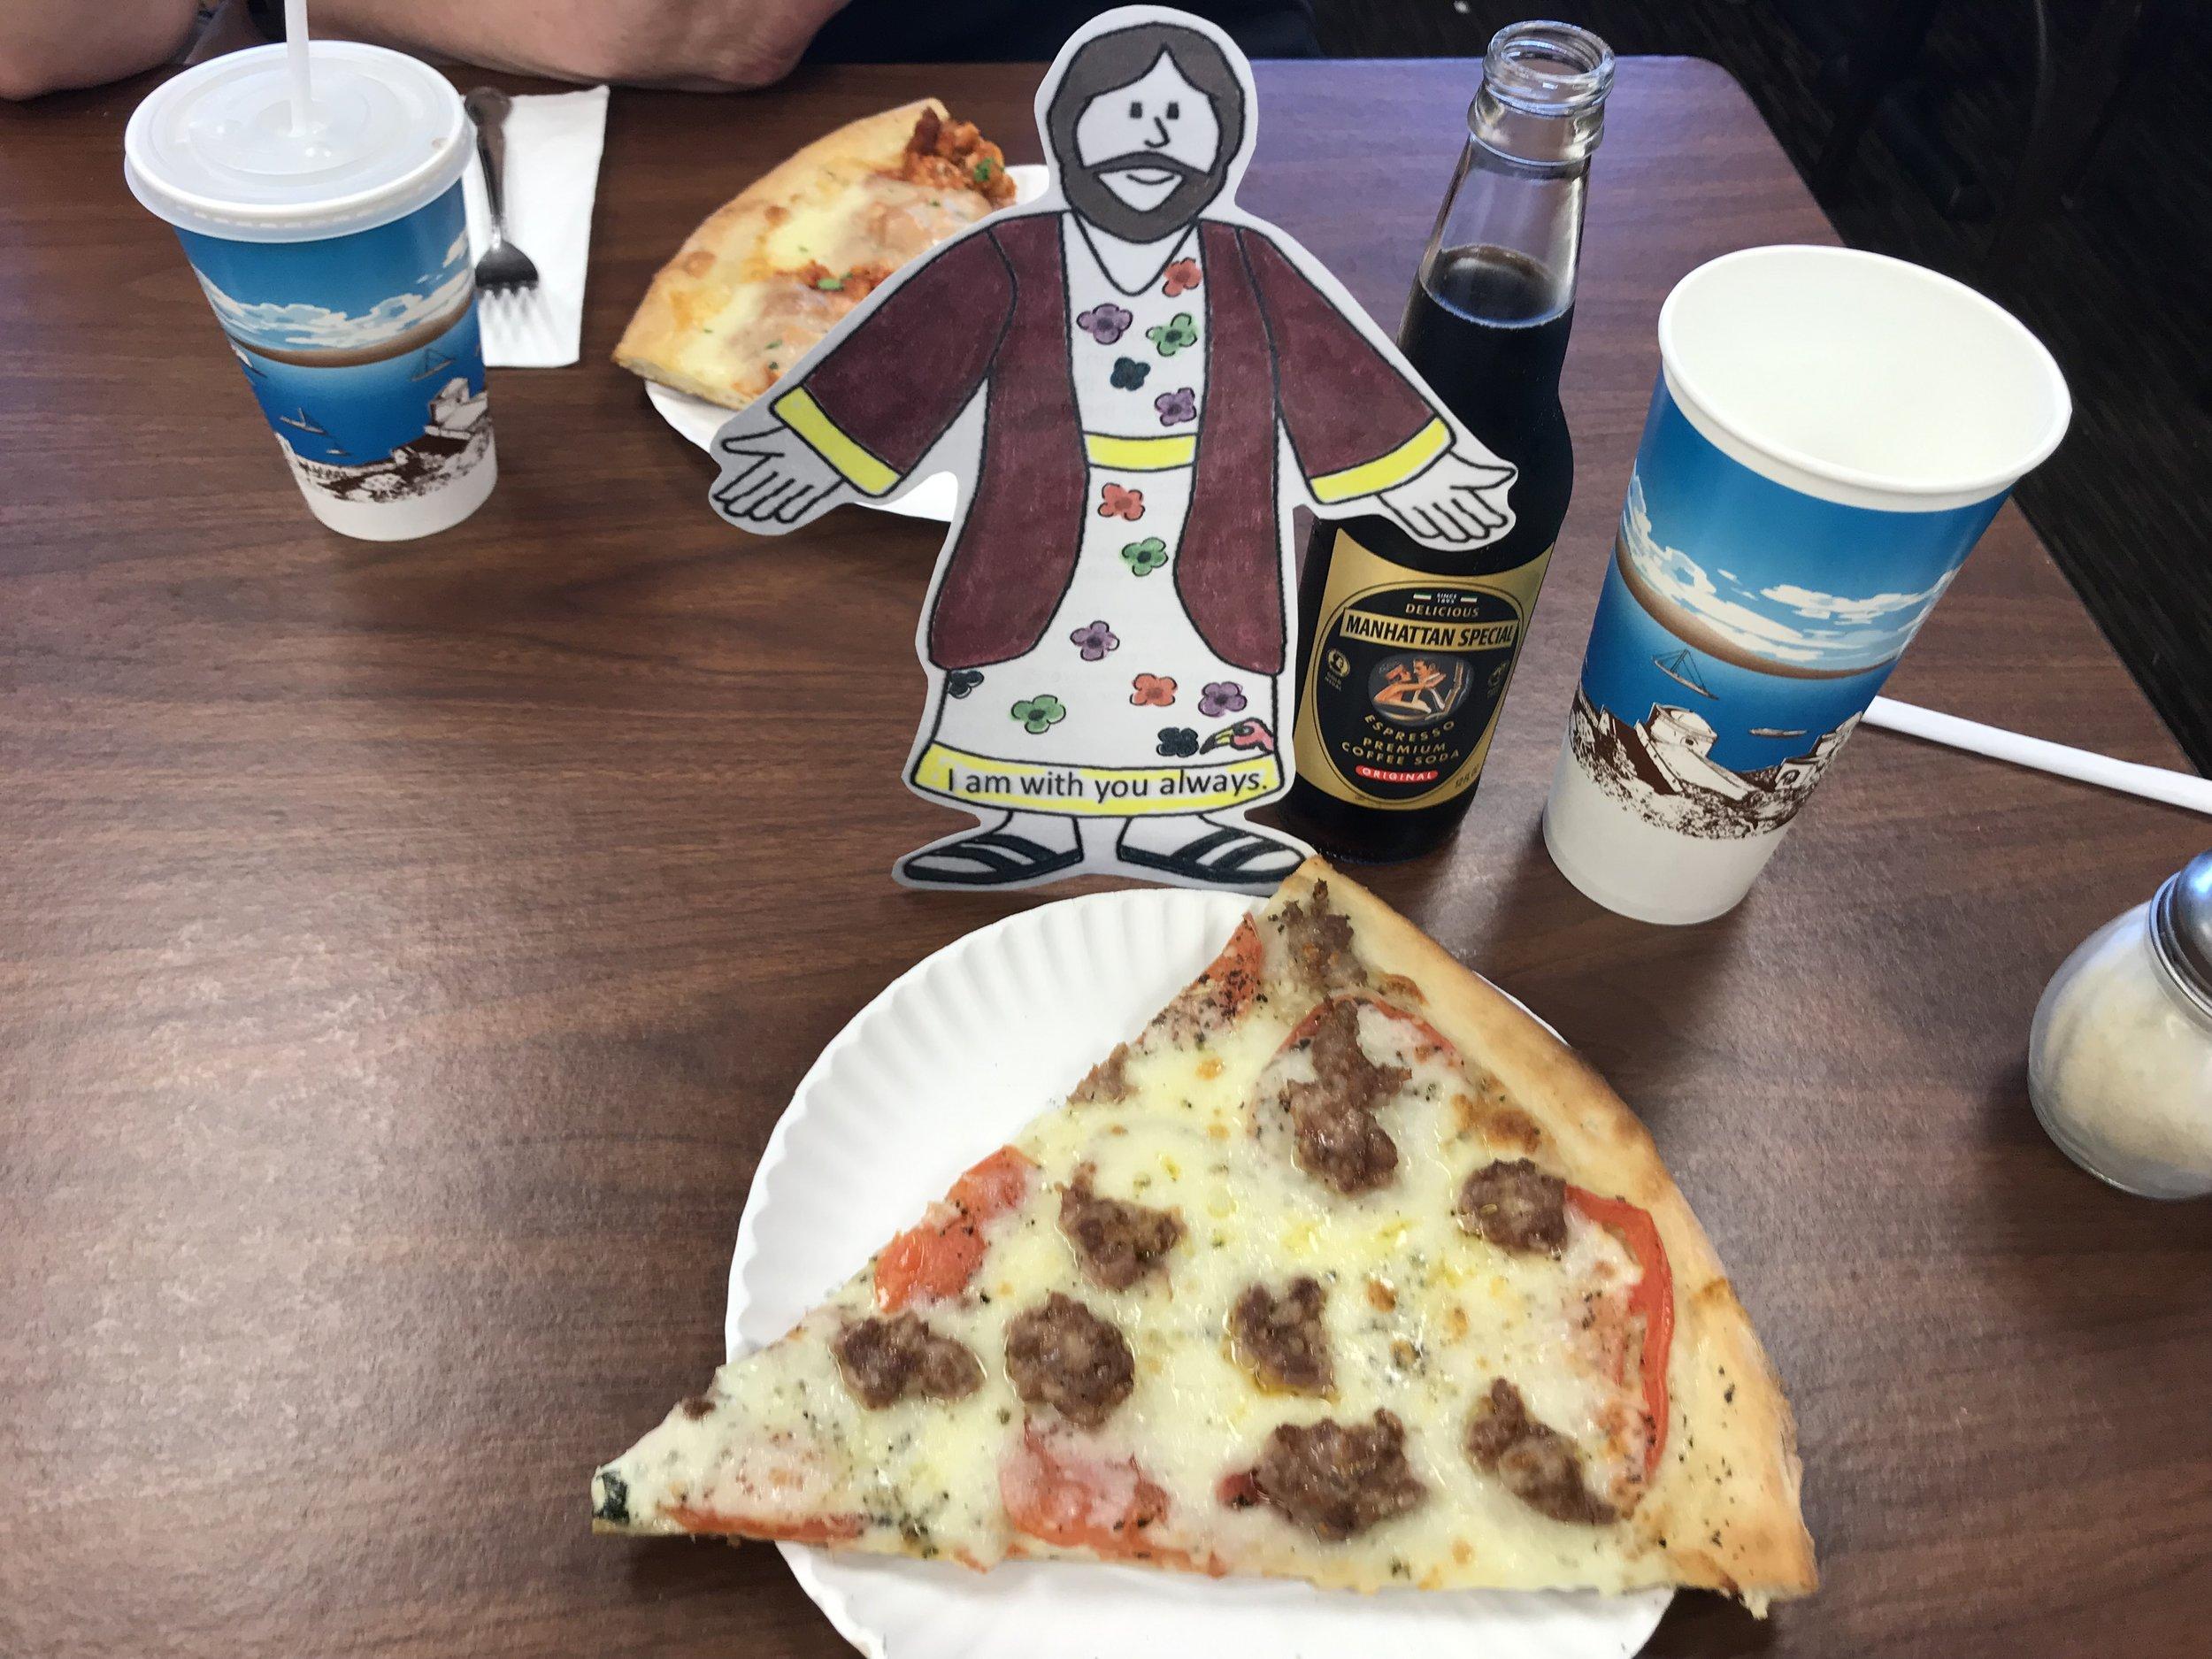 Pizza in Toms River